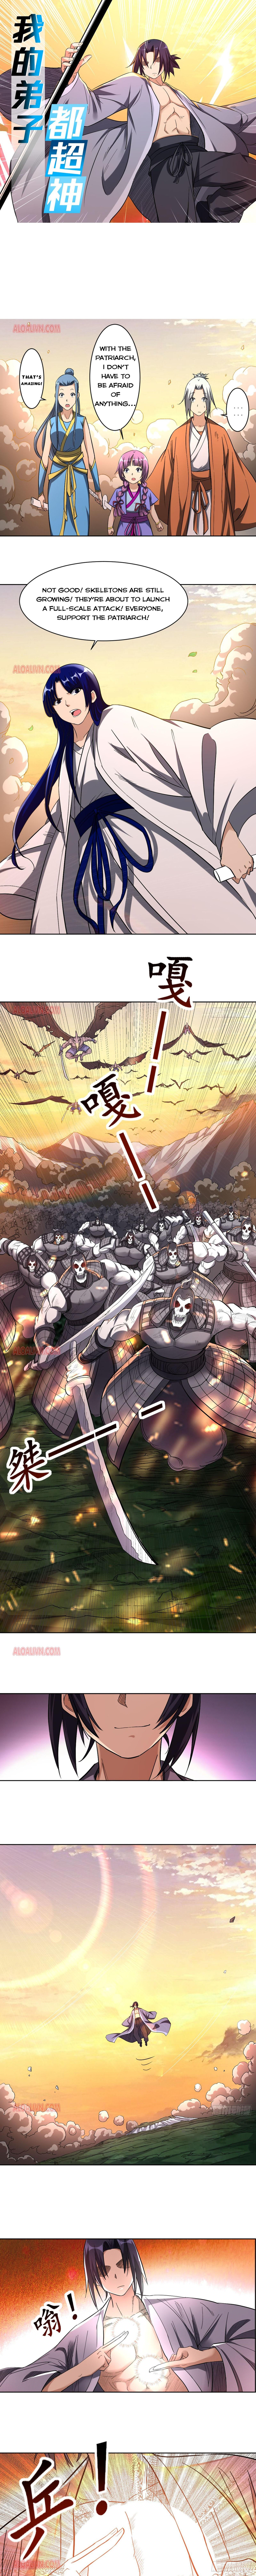 https://manga.mangadogs.com/comics/pic4/4/45572/2716306/f21c444a5dd33eea45ce16801c289d23.jpg Page 1